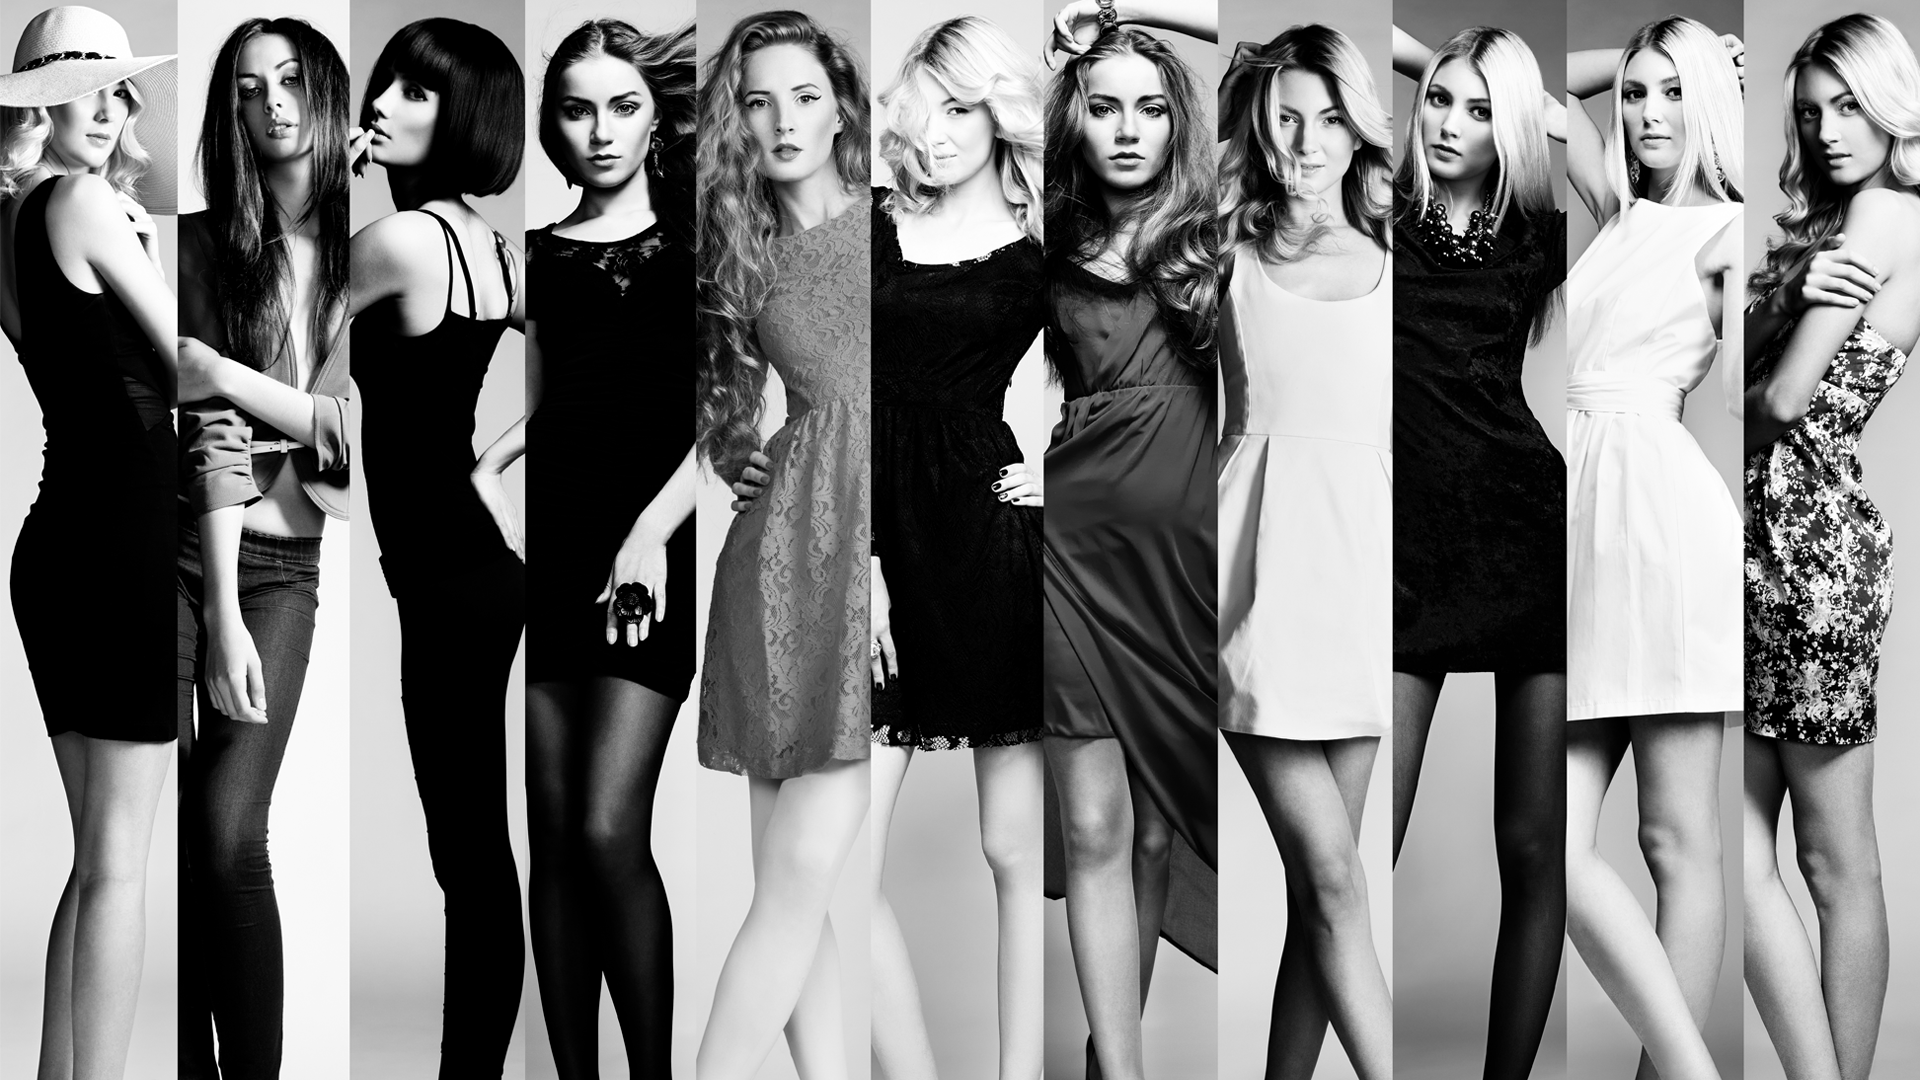 Blog Artikel 7 - Feminine Mode